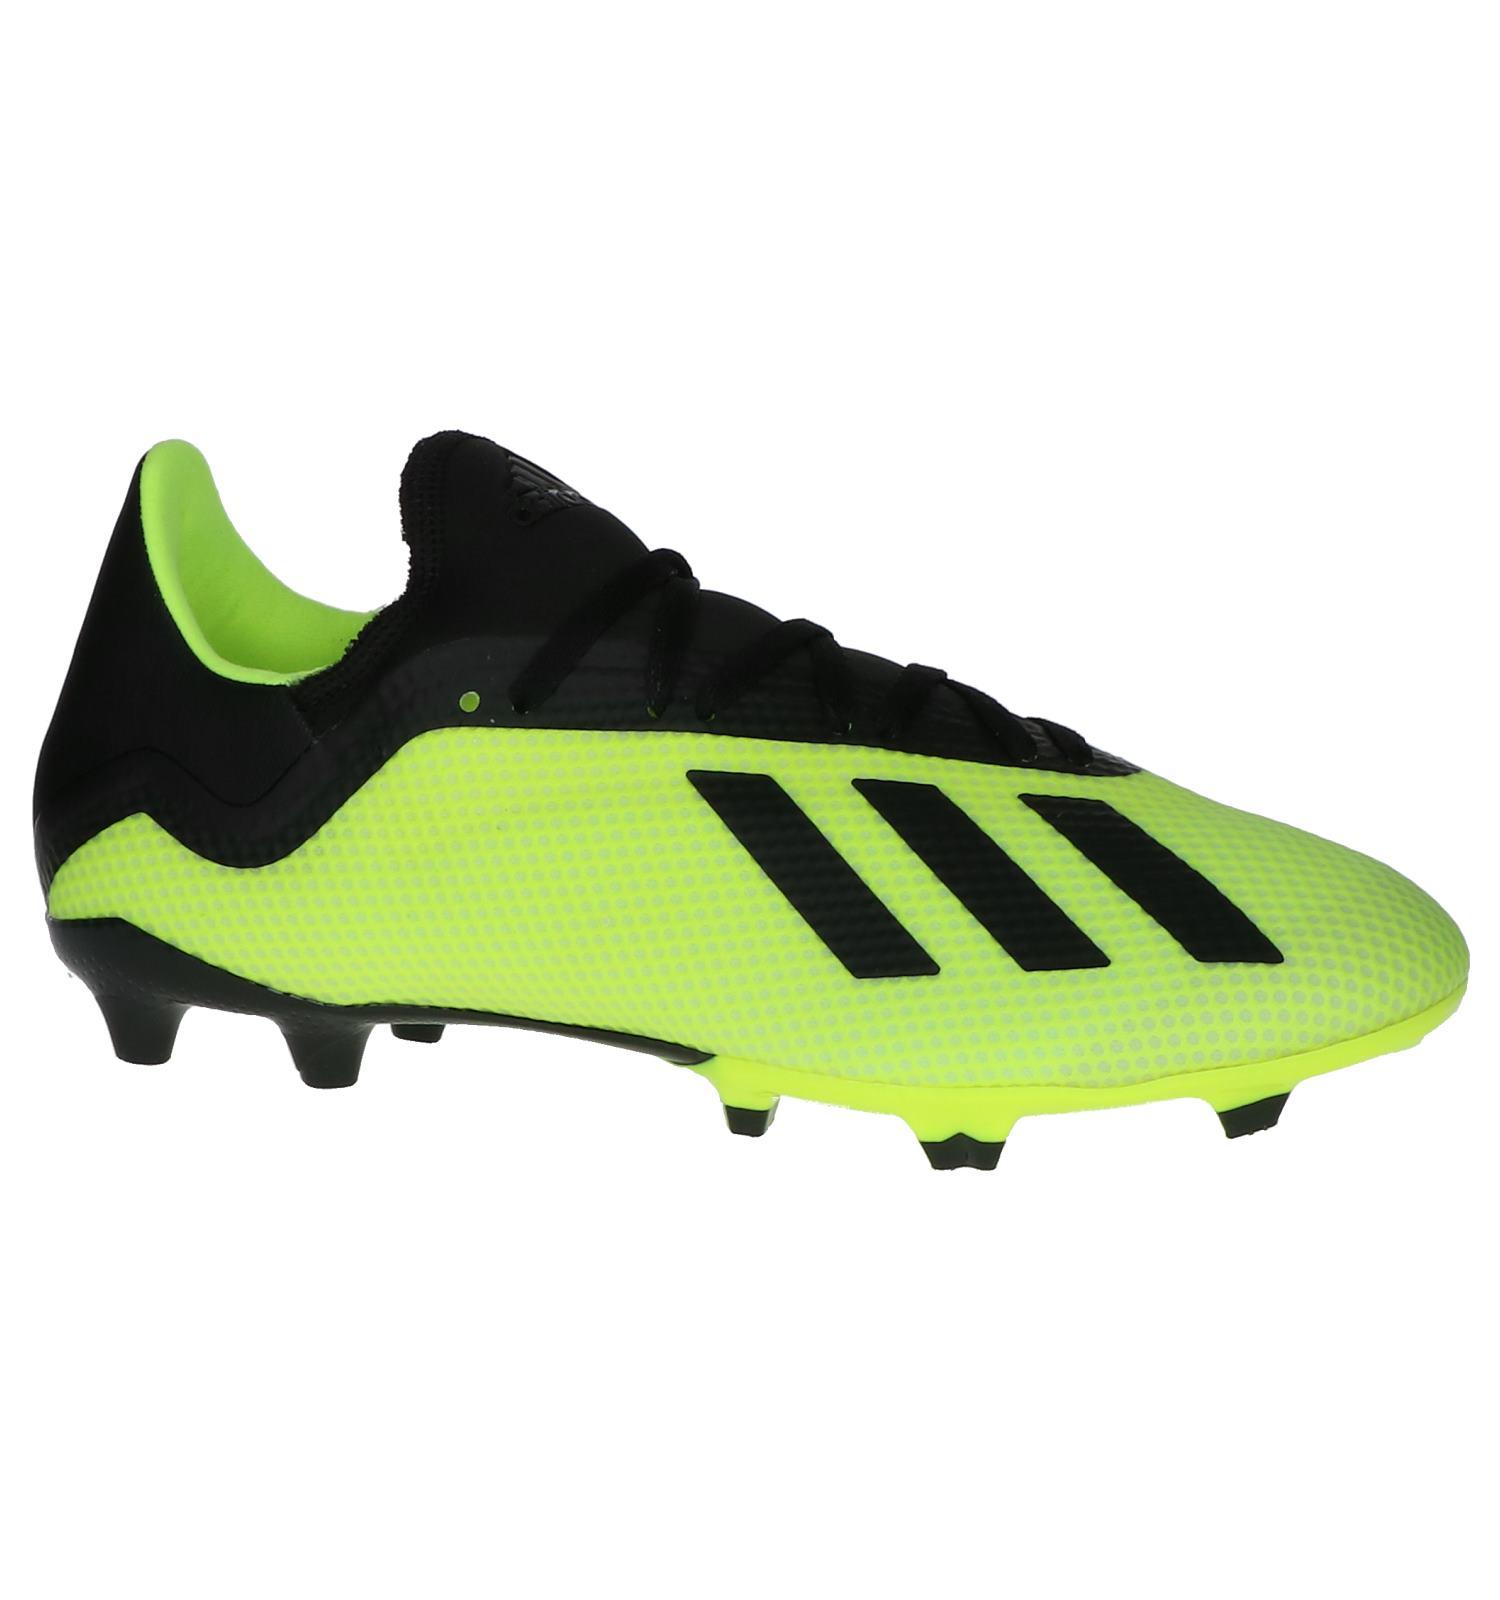 Footbleu Adidas be Et Livraison FluoTorfs Chaussures De Ygvby6f7